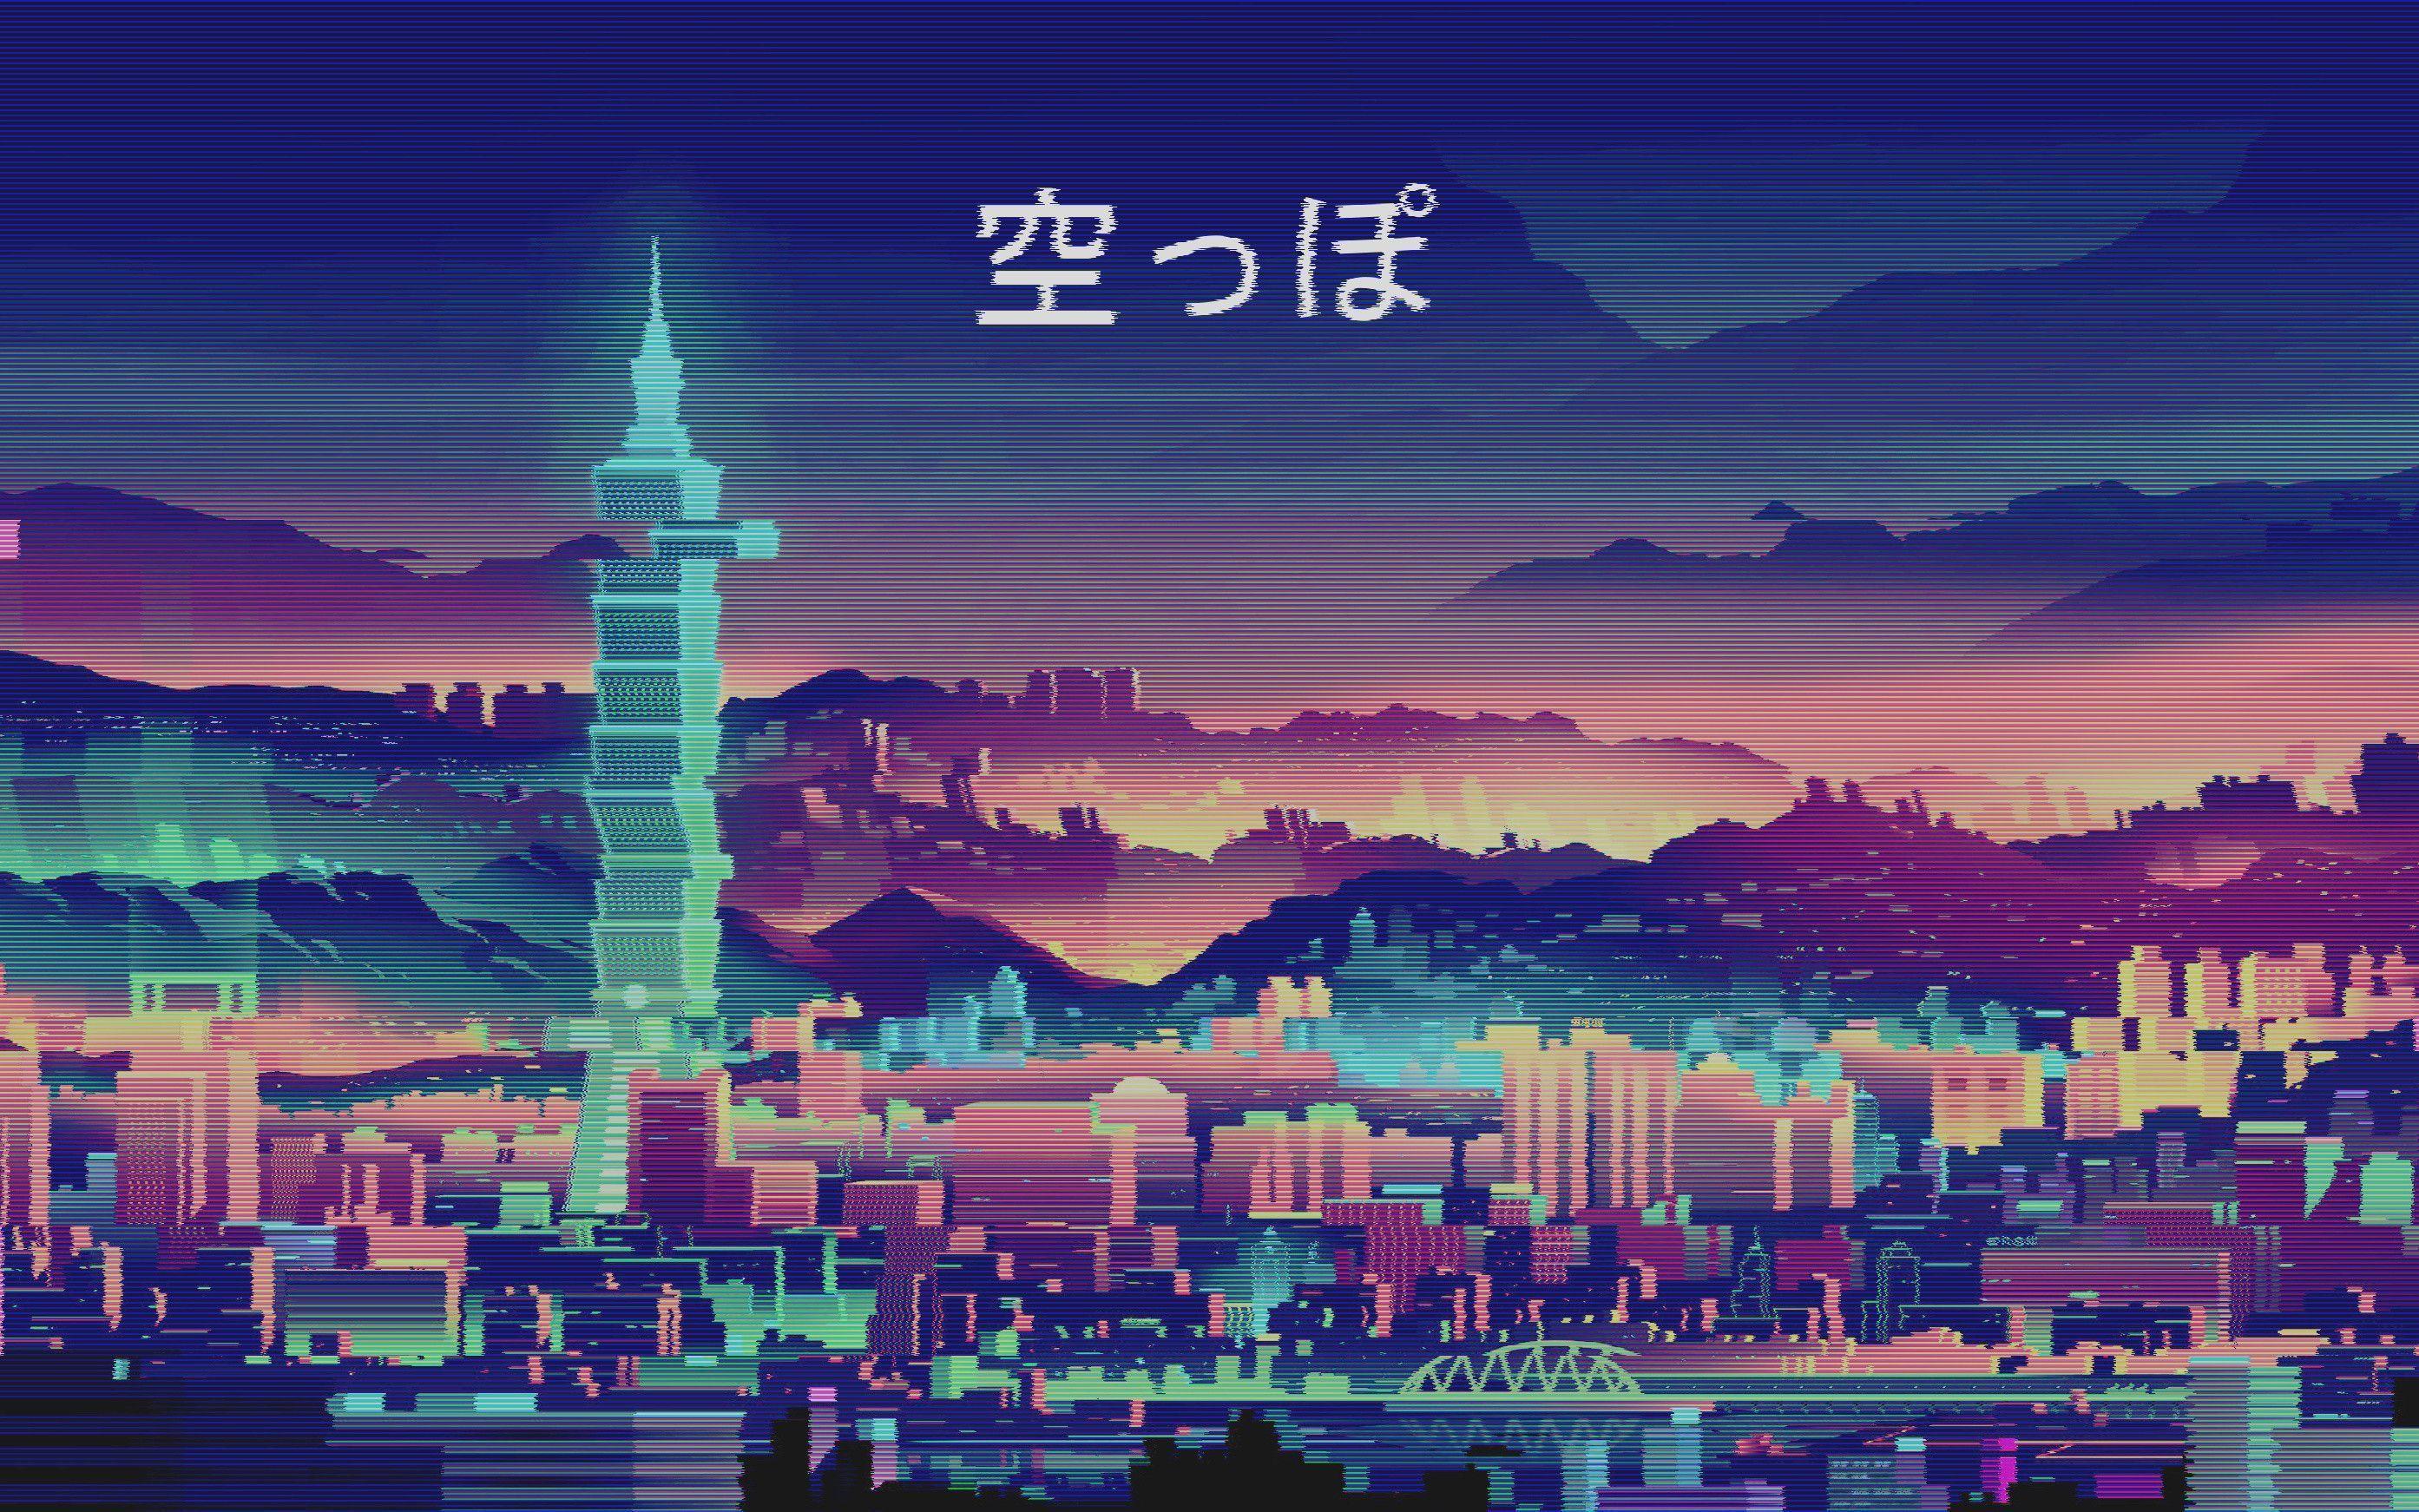 City Aesthetic Desktop Wallpapers Top Free City Aesthetic Desktop Backgrounds Wallp In 2020 Aesthetic Desktop Wallpaper Vaporwave Wallpaper Anime Scenery Wallpaper